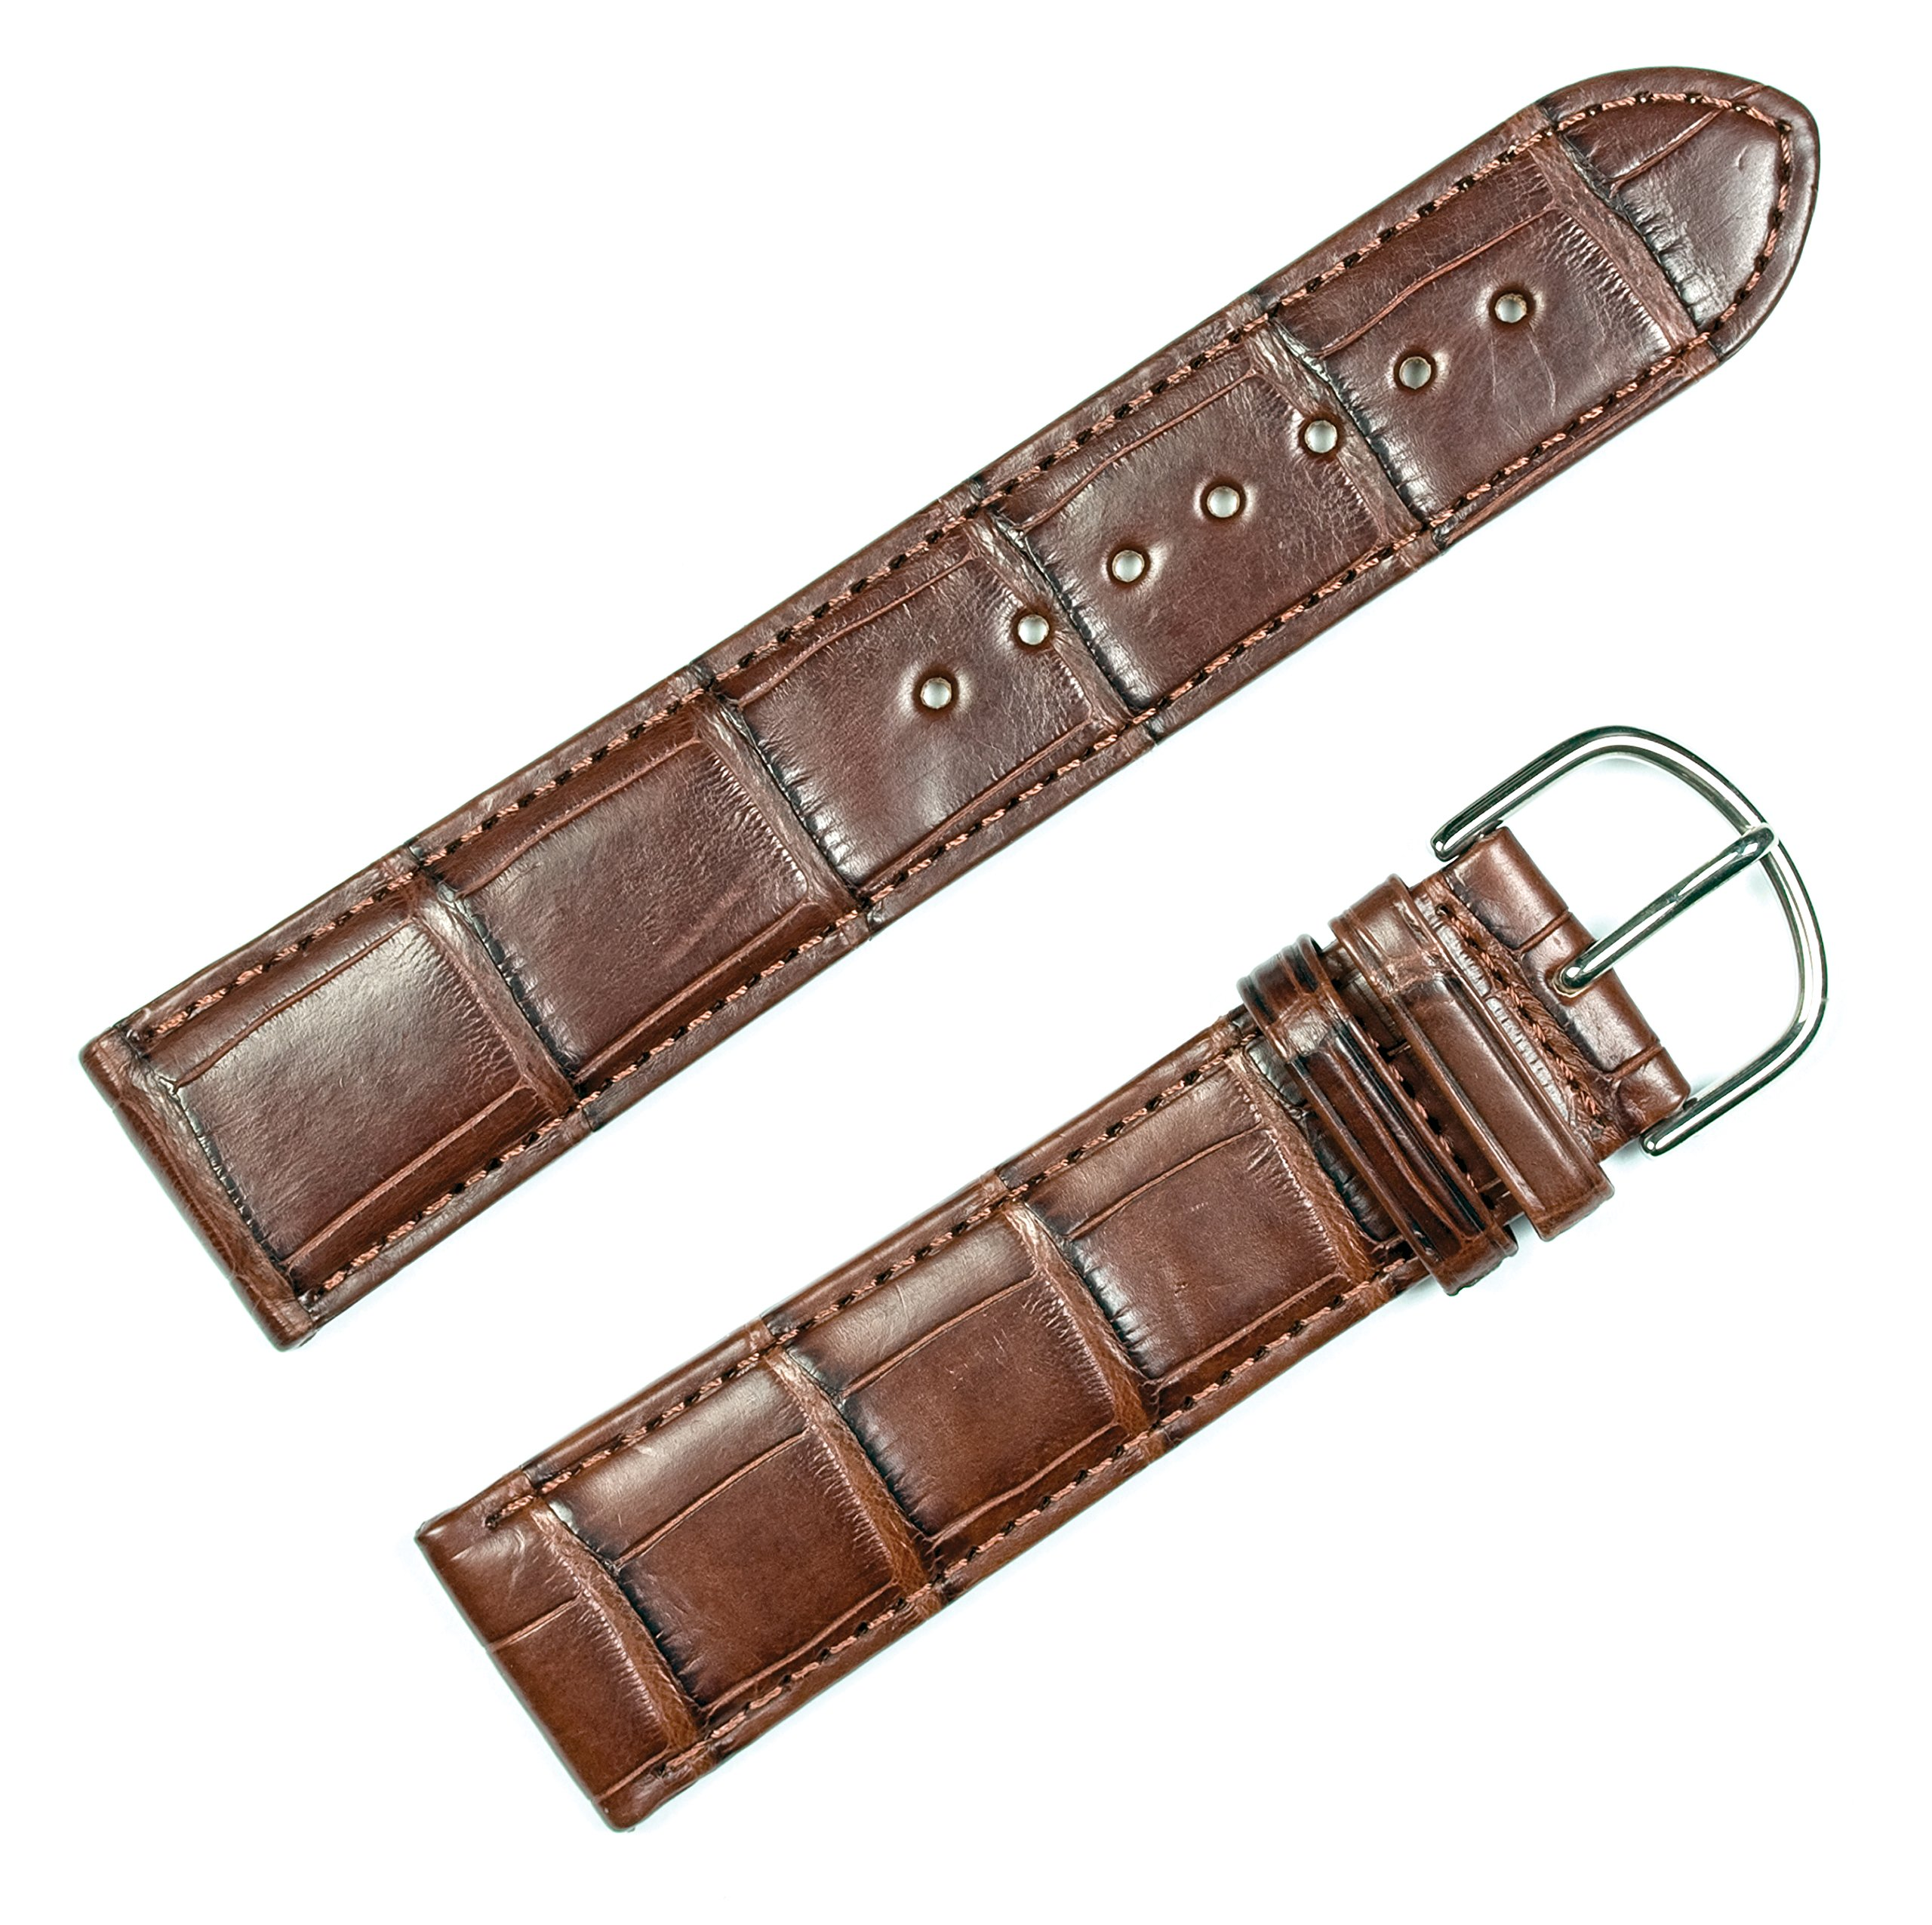 Genuine Alligator Watchband Brown 20mm Watch Band by deBeer